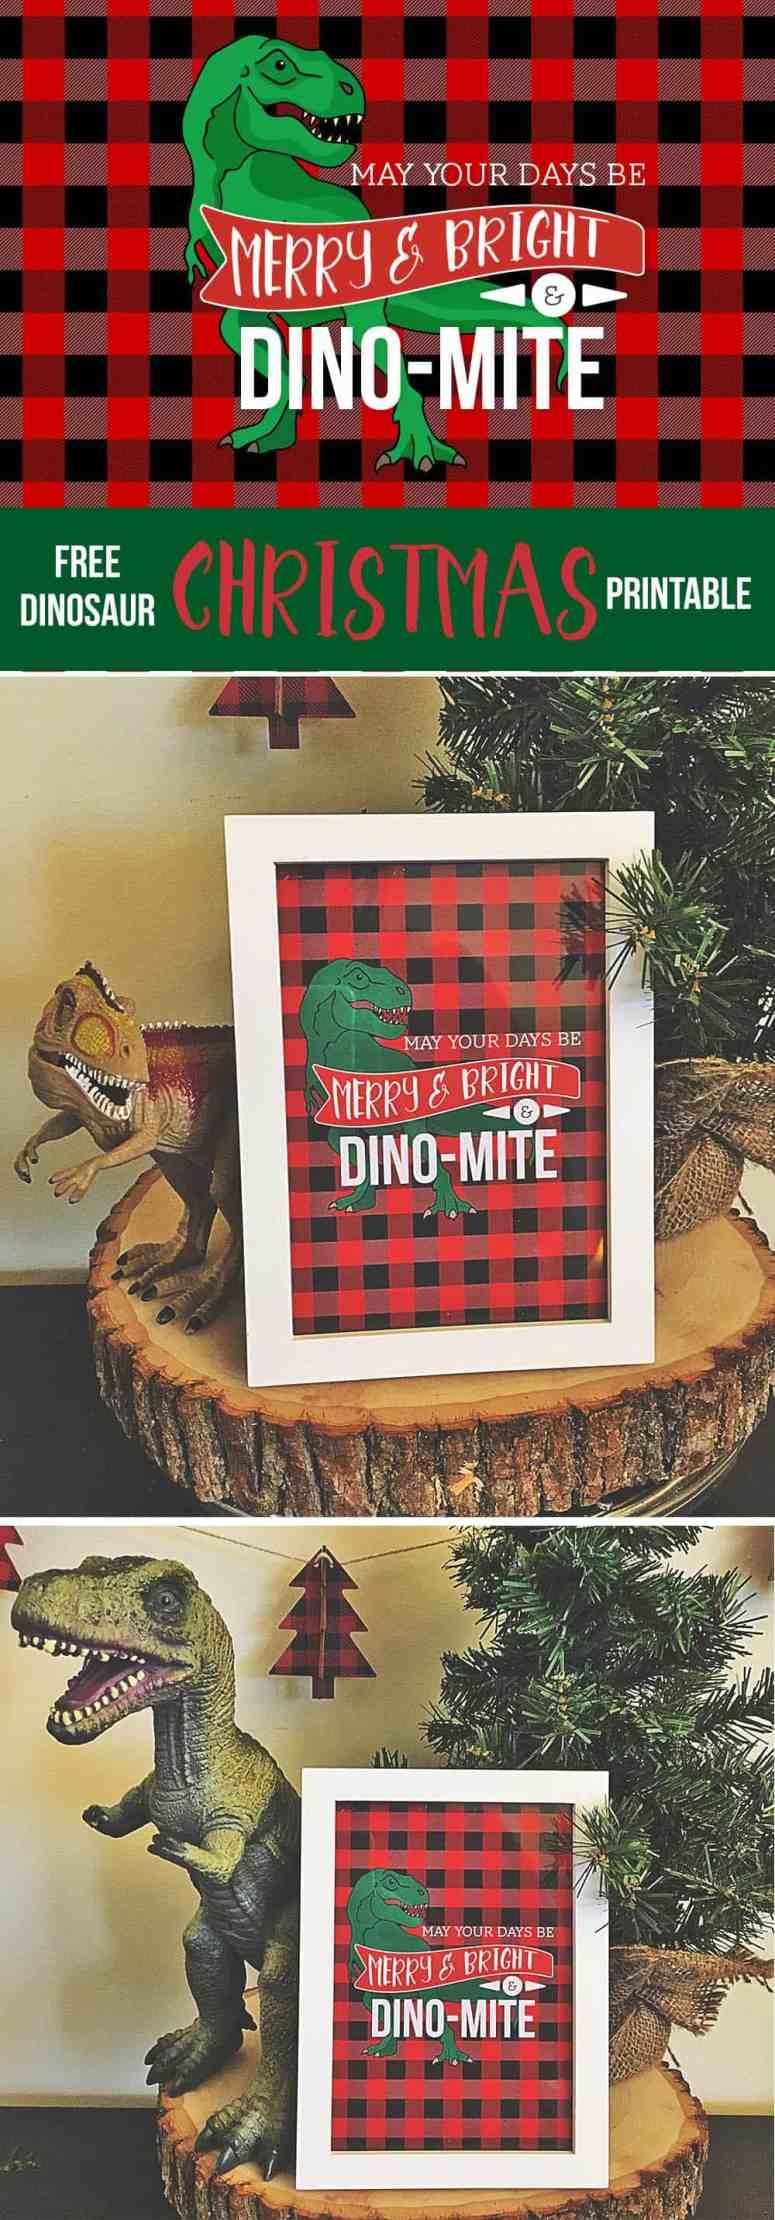 Free Dinosaur Christmas printable from Elva M Design Studio